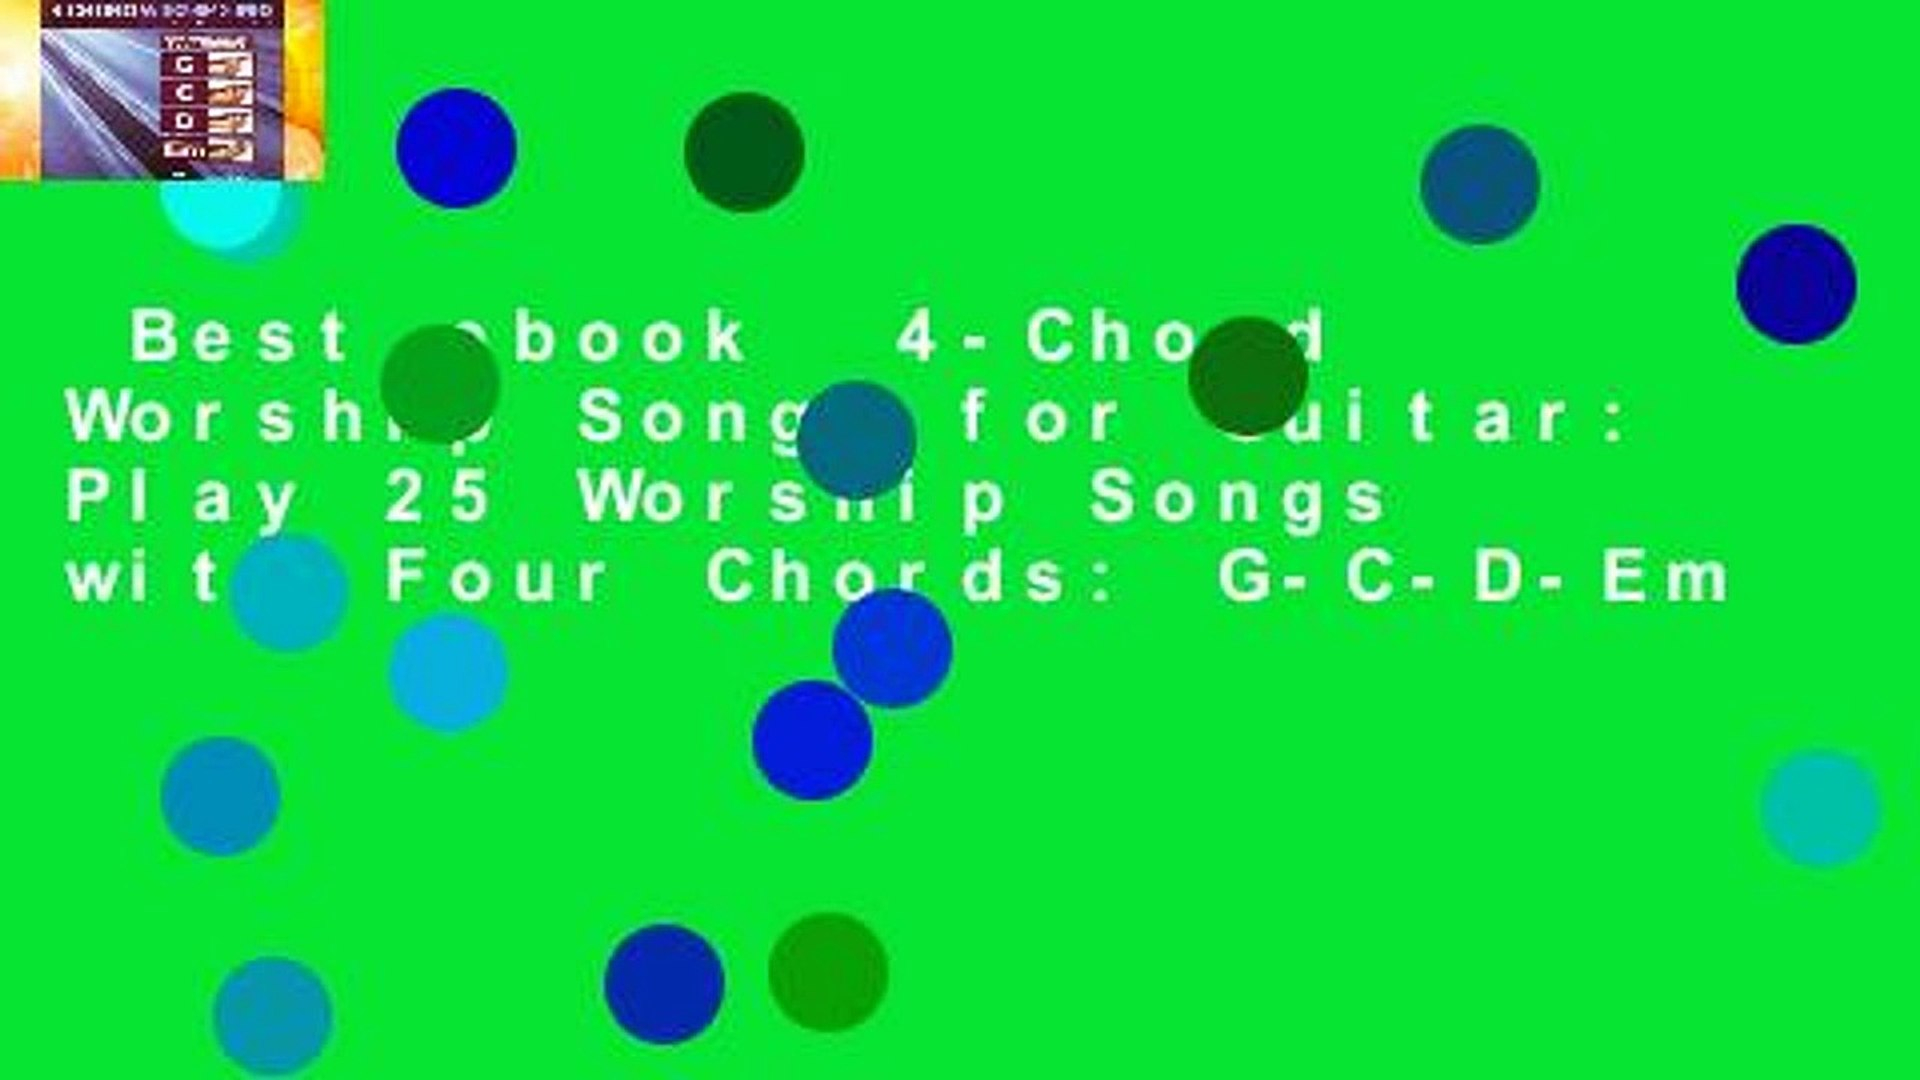 Four Chord Song Best Ebook 4 Chord Worship Songs For Guitar Play 25 Worship Songs With Four Chords G C D Em